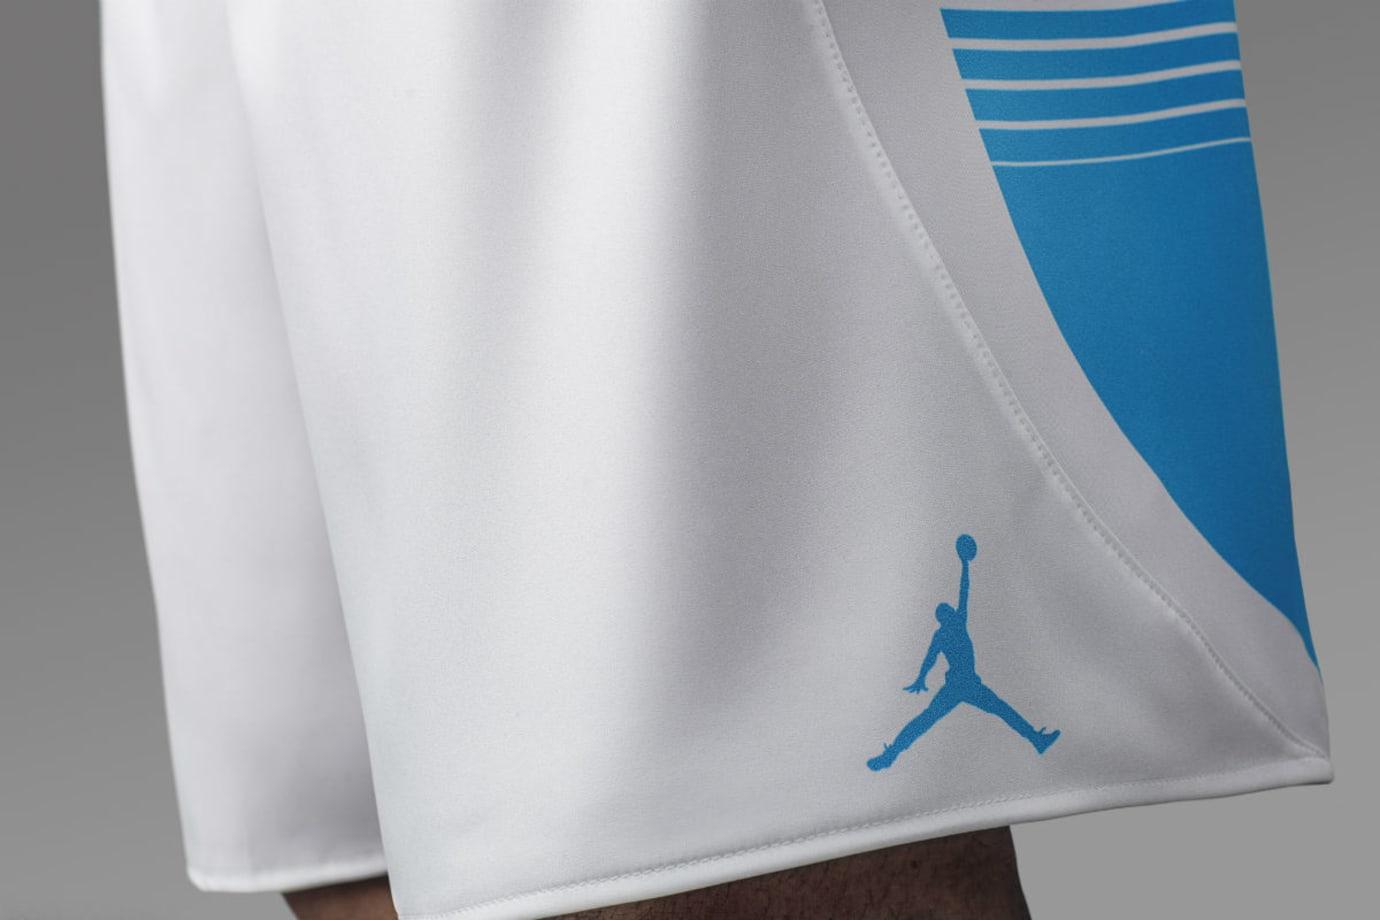 Jordan Brand Argentina Basketball Uniforms 2017 (4)